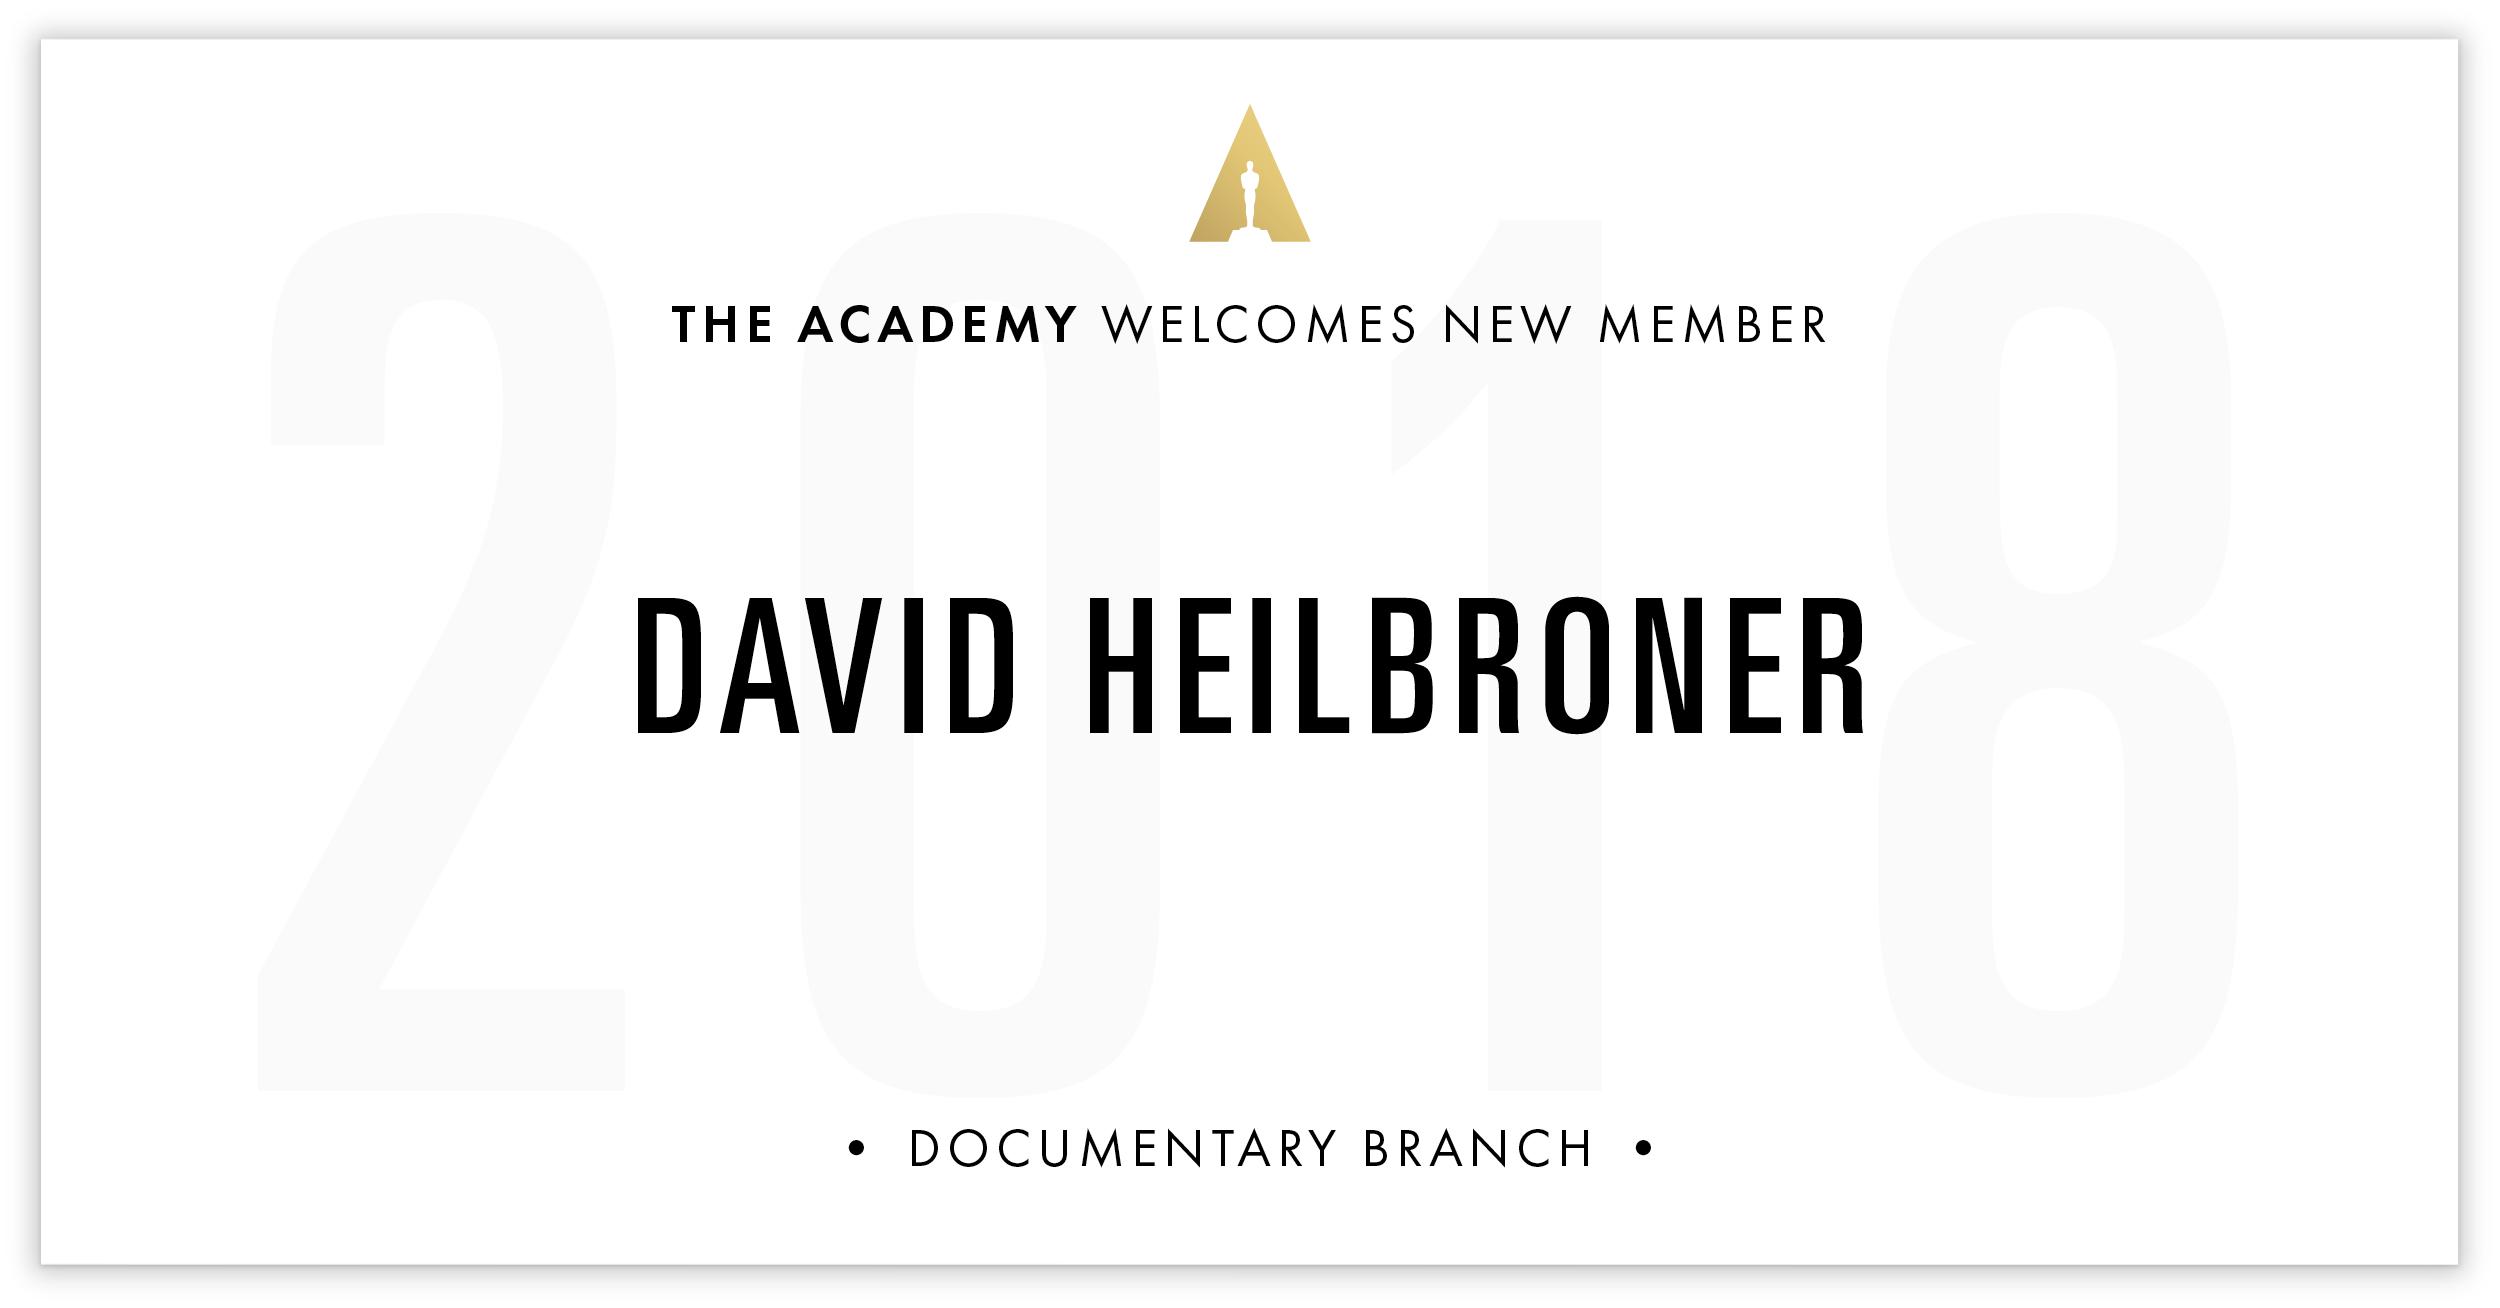 David Heilbroner is invited!